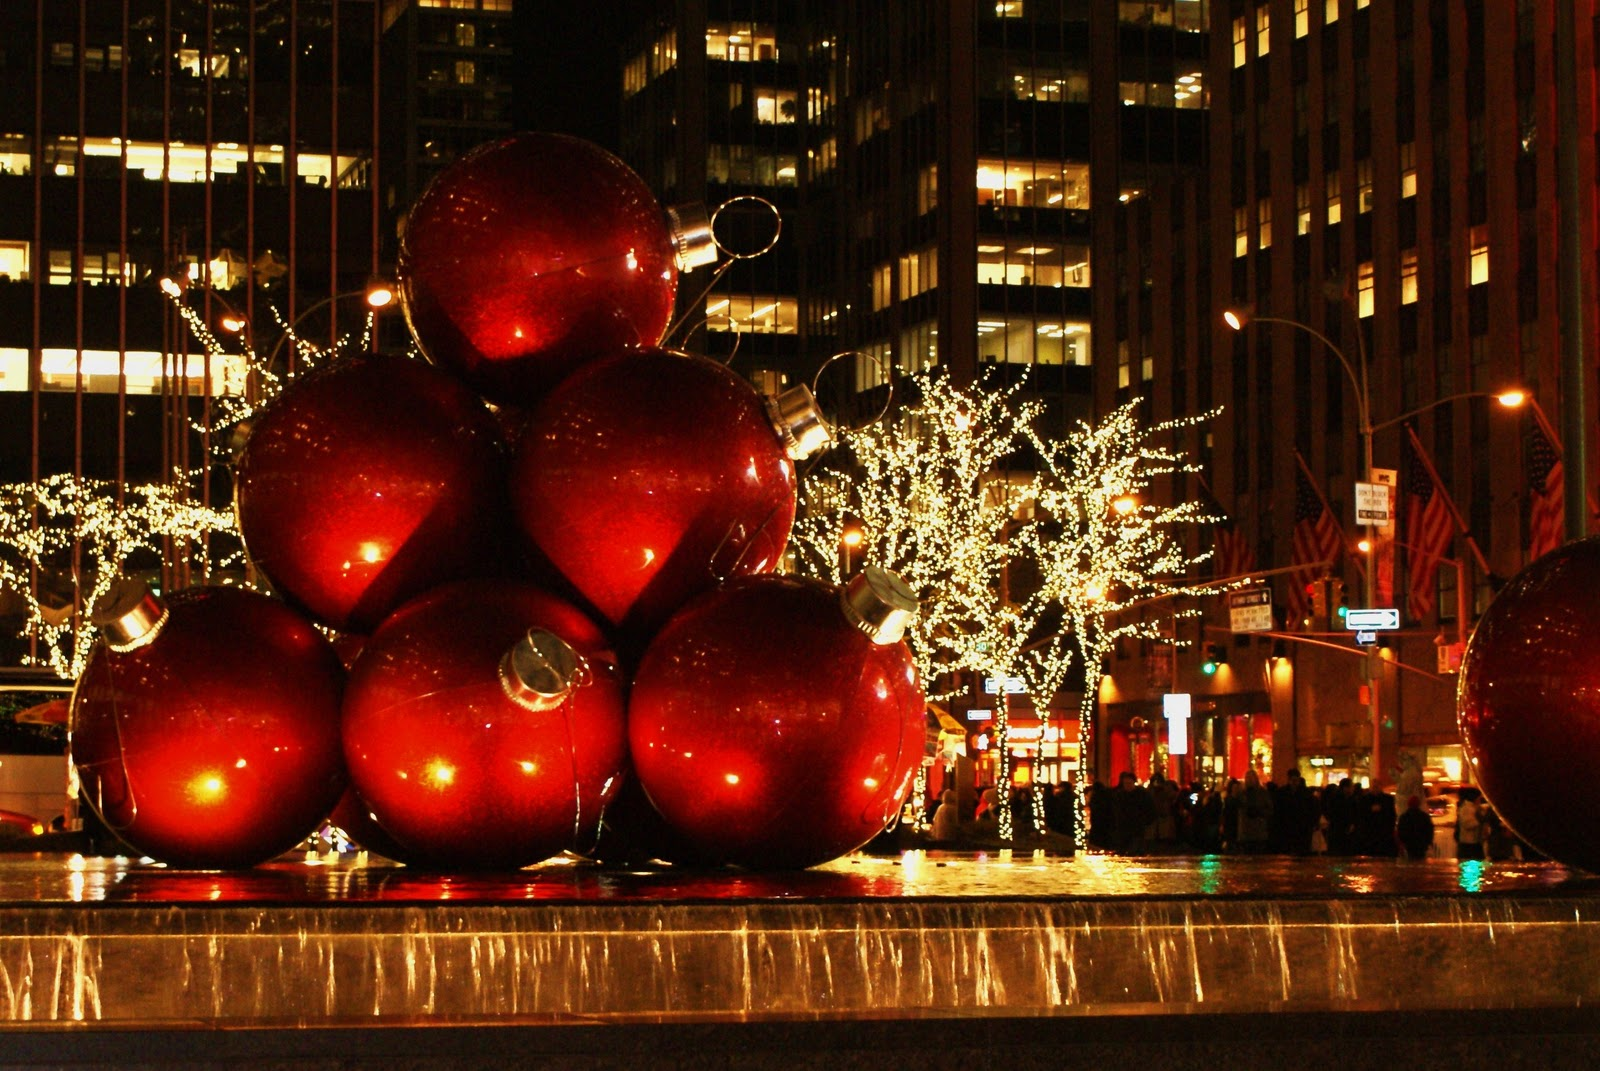 'Tis The Season: December 2010